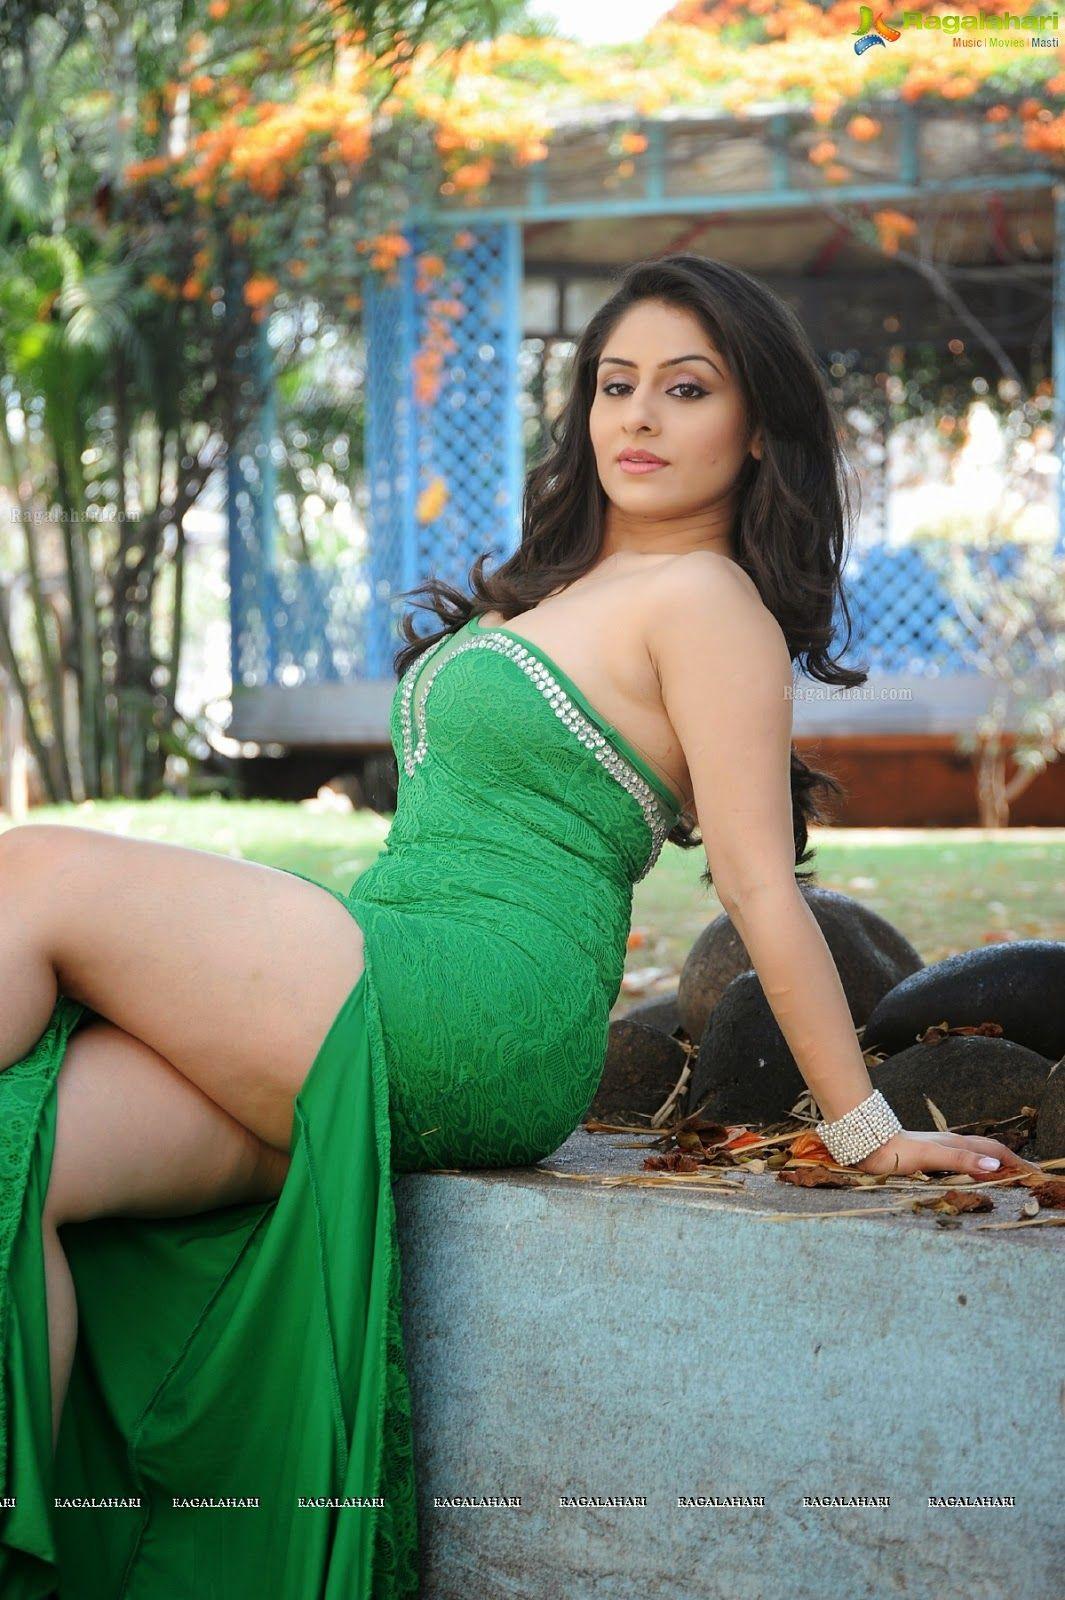 Ankita Sharma nudes (67 photo), Topless, Fappening, Selfie, butt 2020